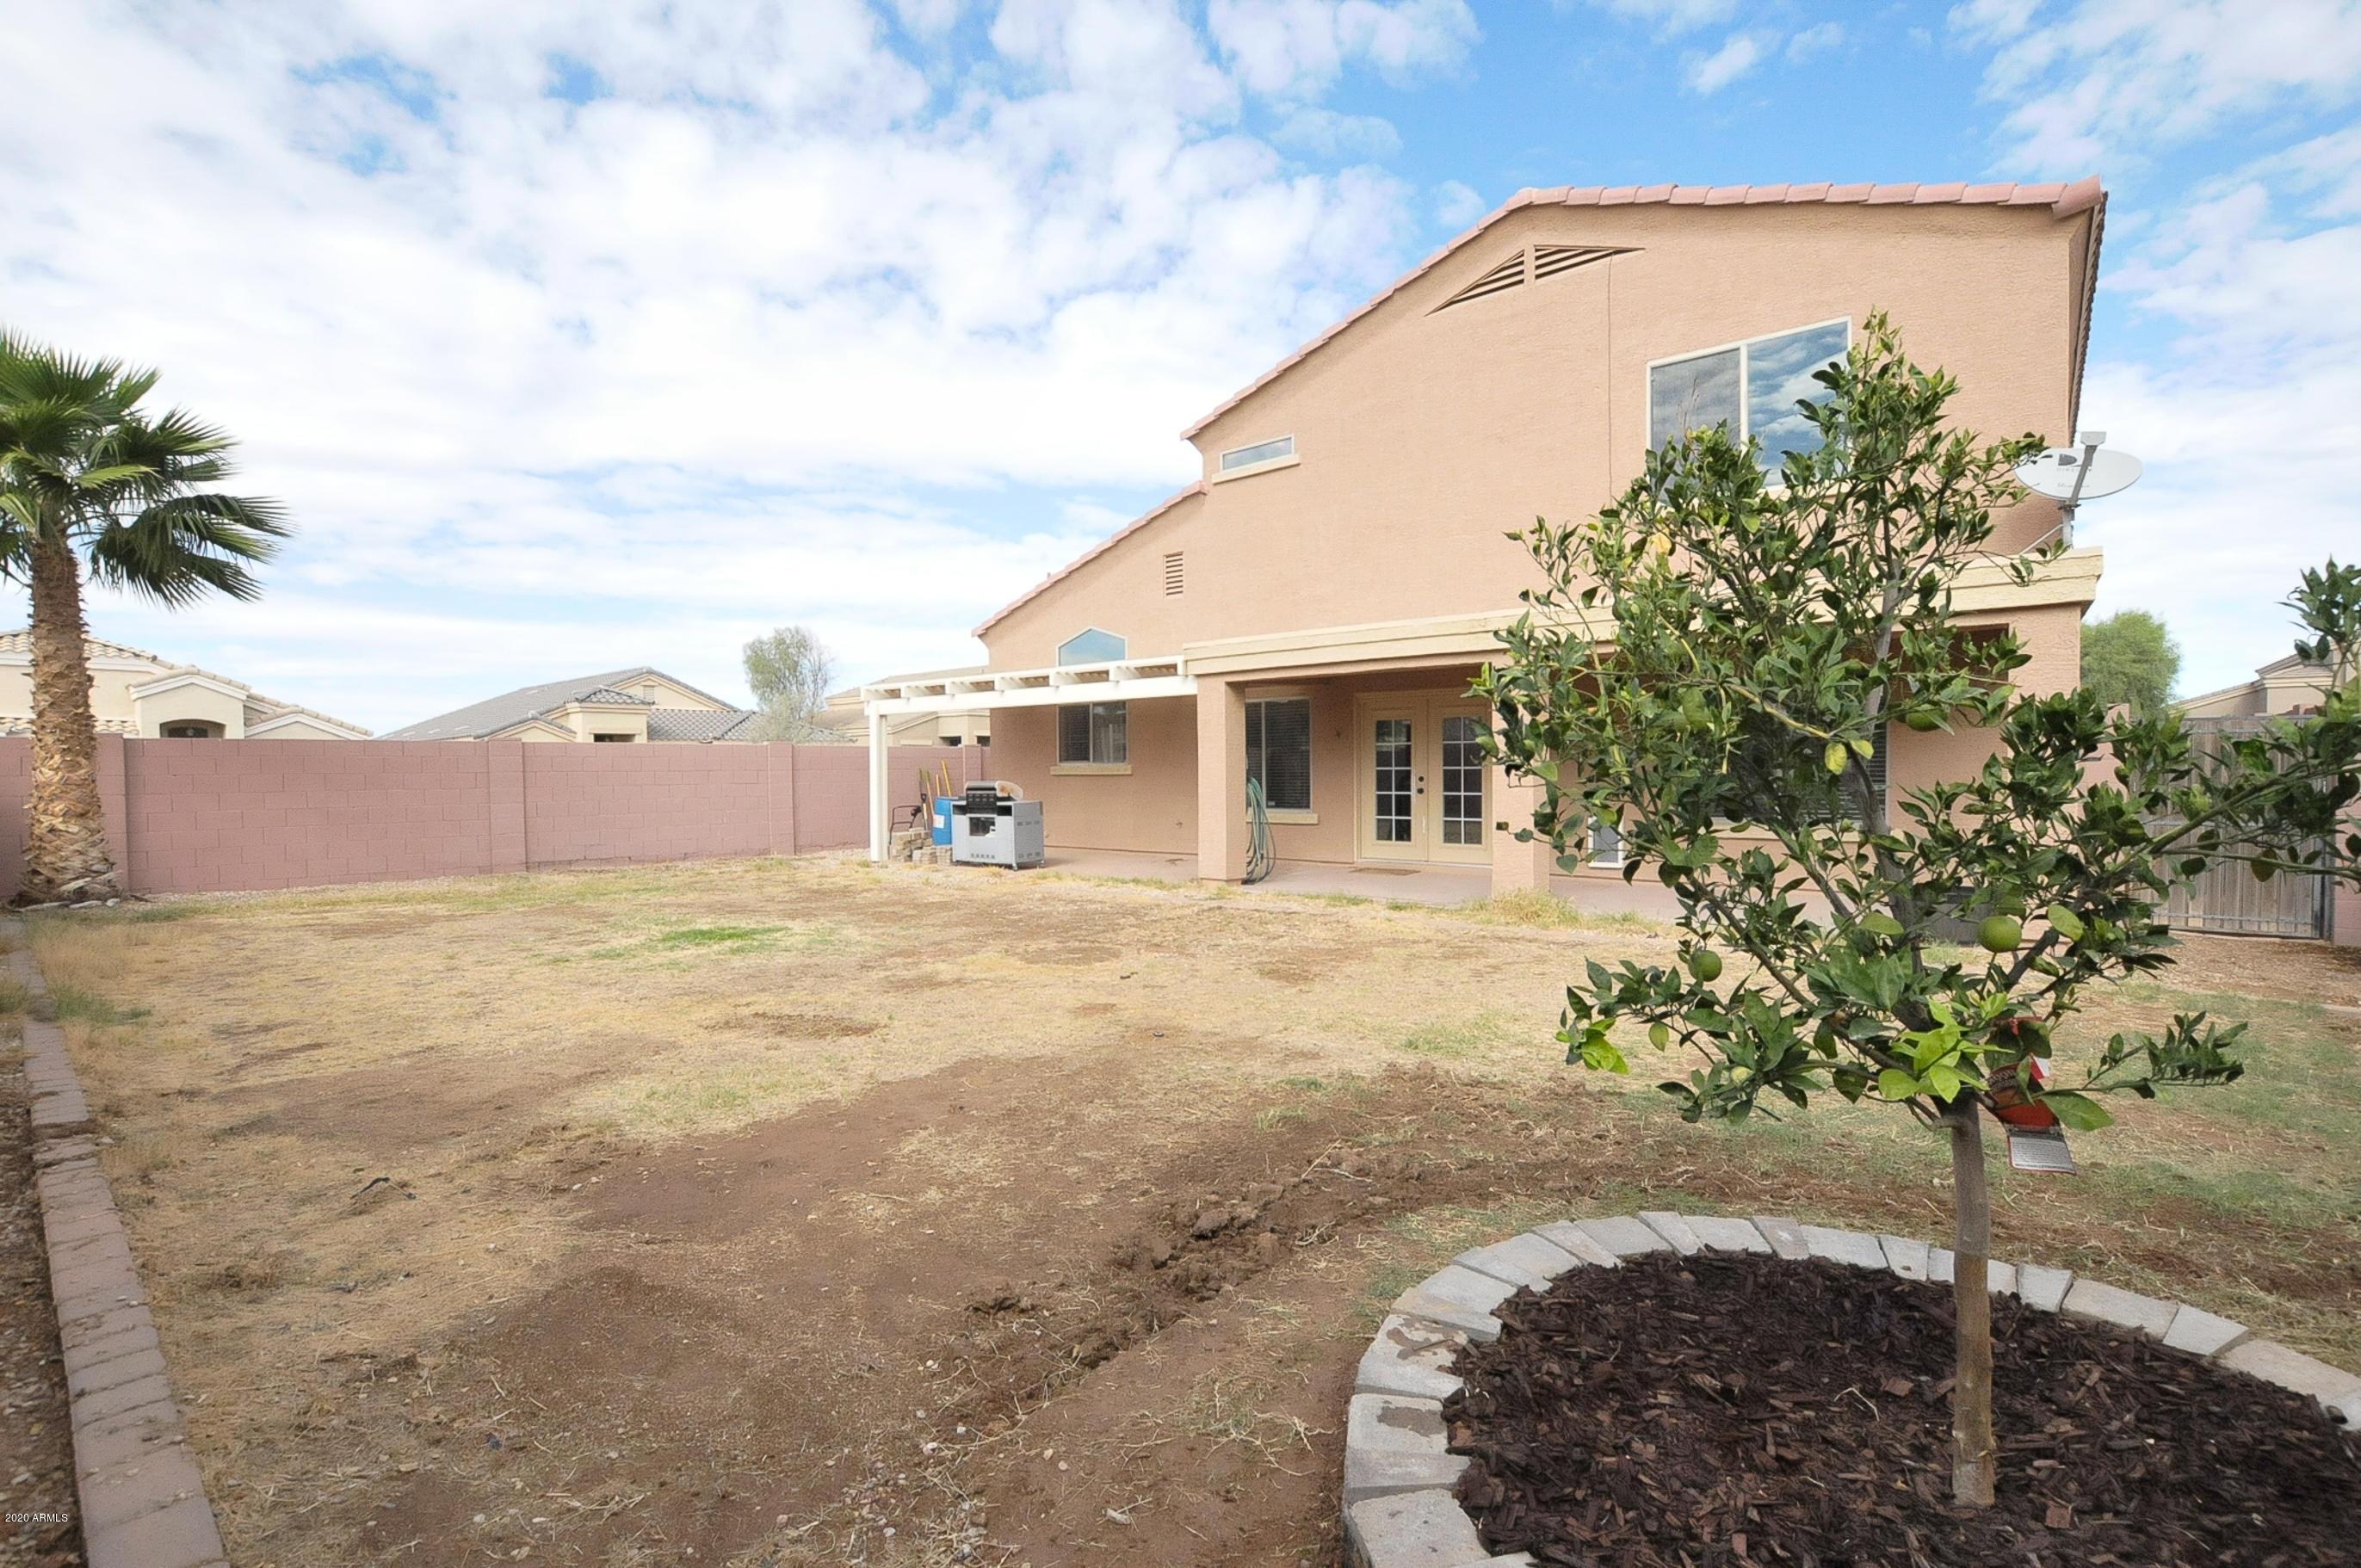 MLS 6158381 1617 E DIEGO Drive, Casa Grande, AZ 85122 Casa Grande AZ Mission Valley